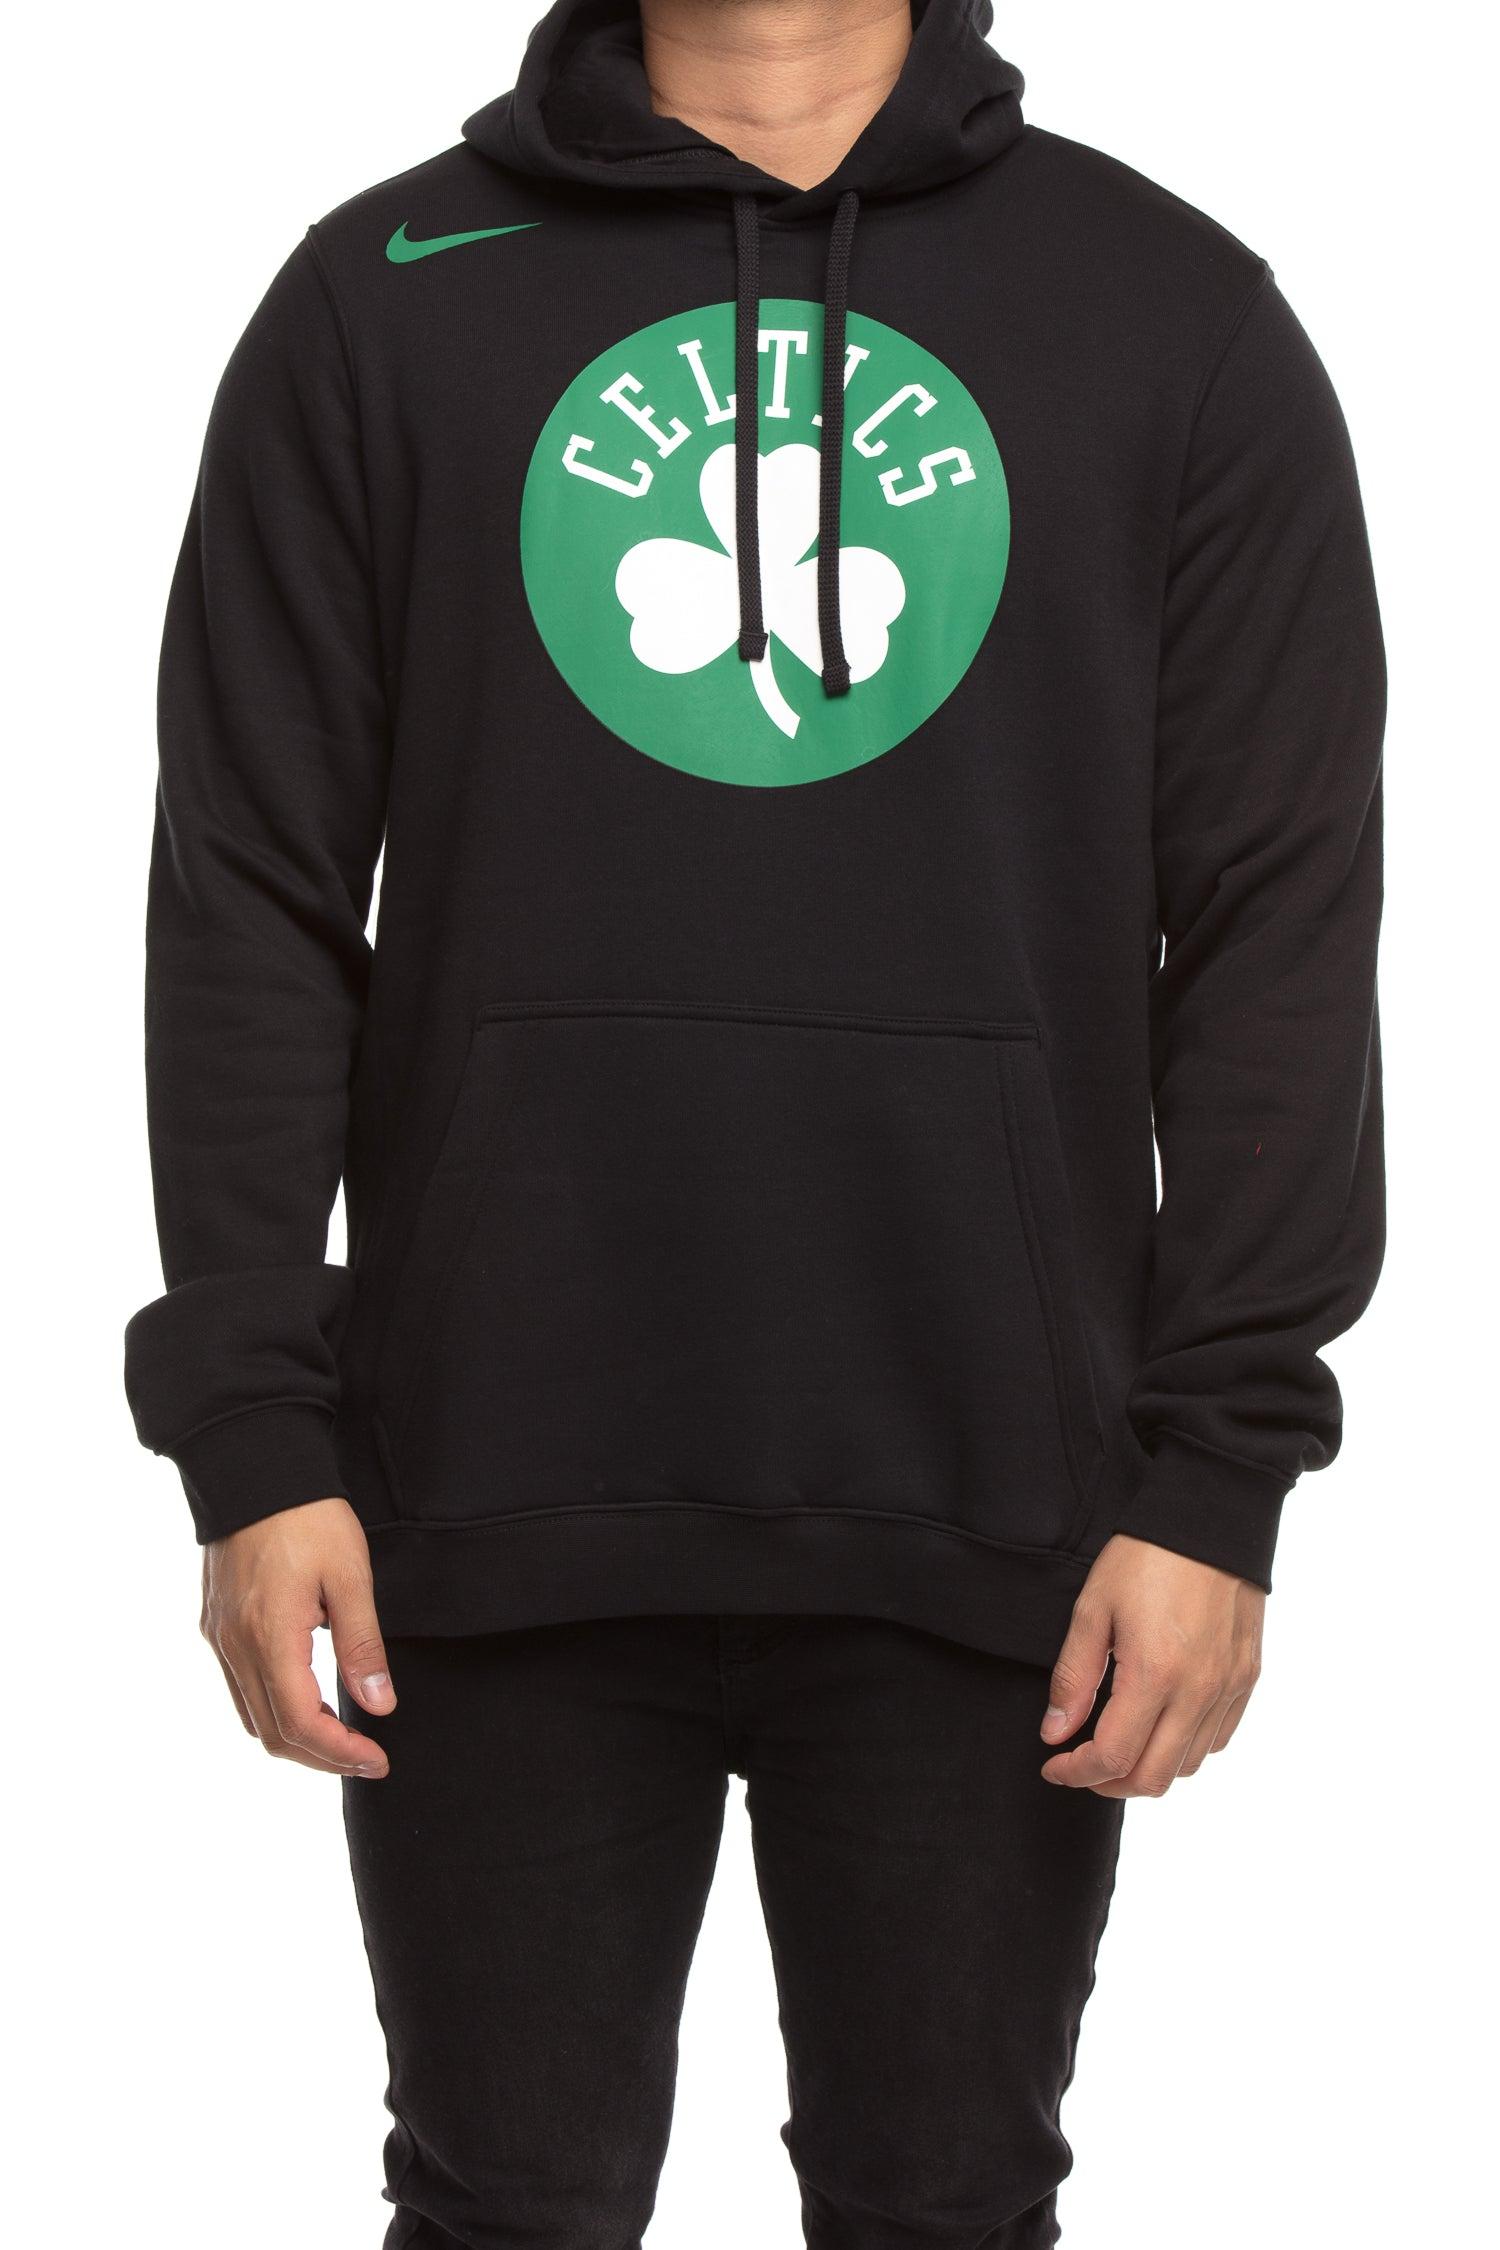 Boston Celtics Fleece 19 Hoodie